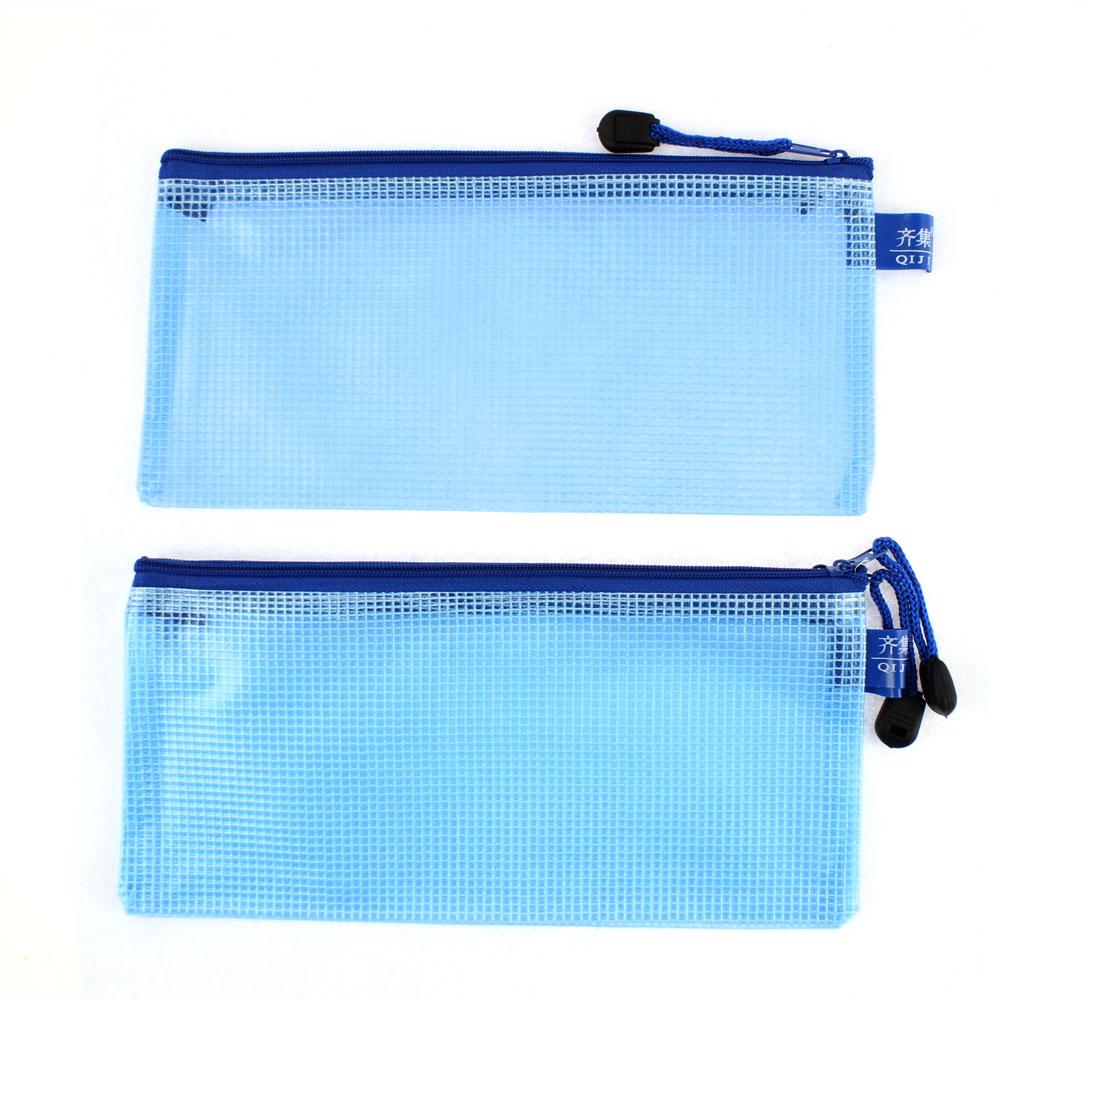 Blue Office File Document Folder Bag Mesh Pouch Holder Organizer 3pcs